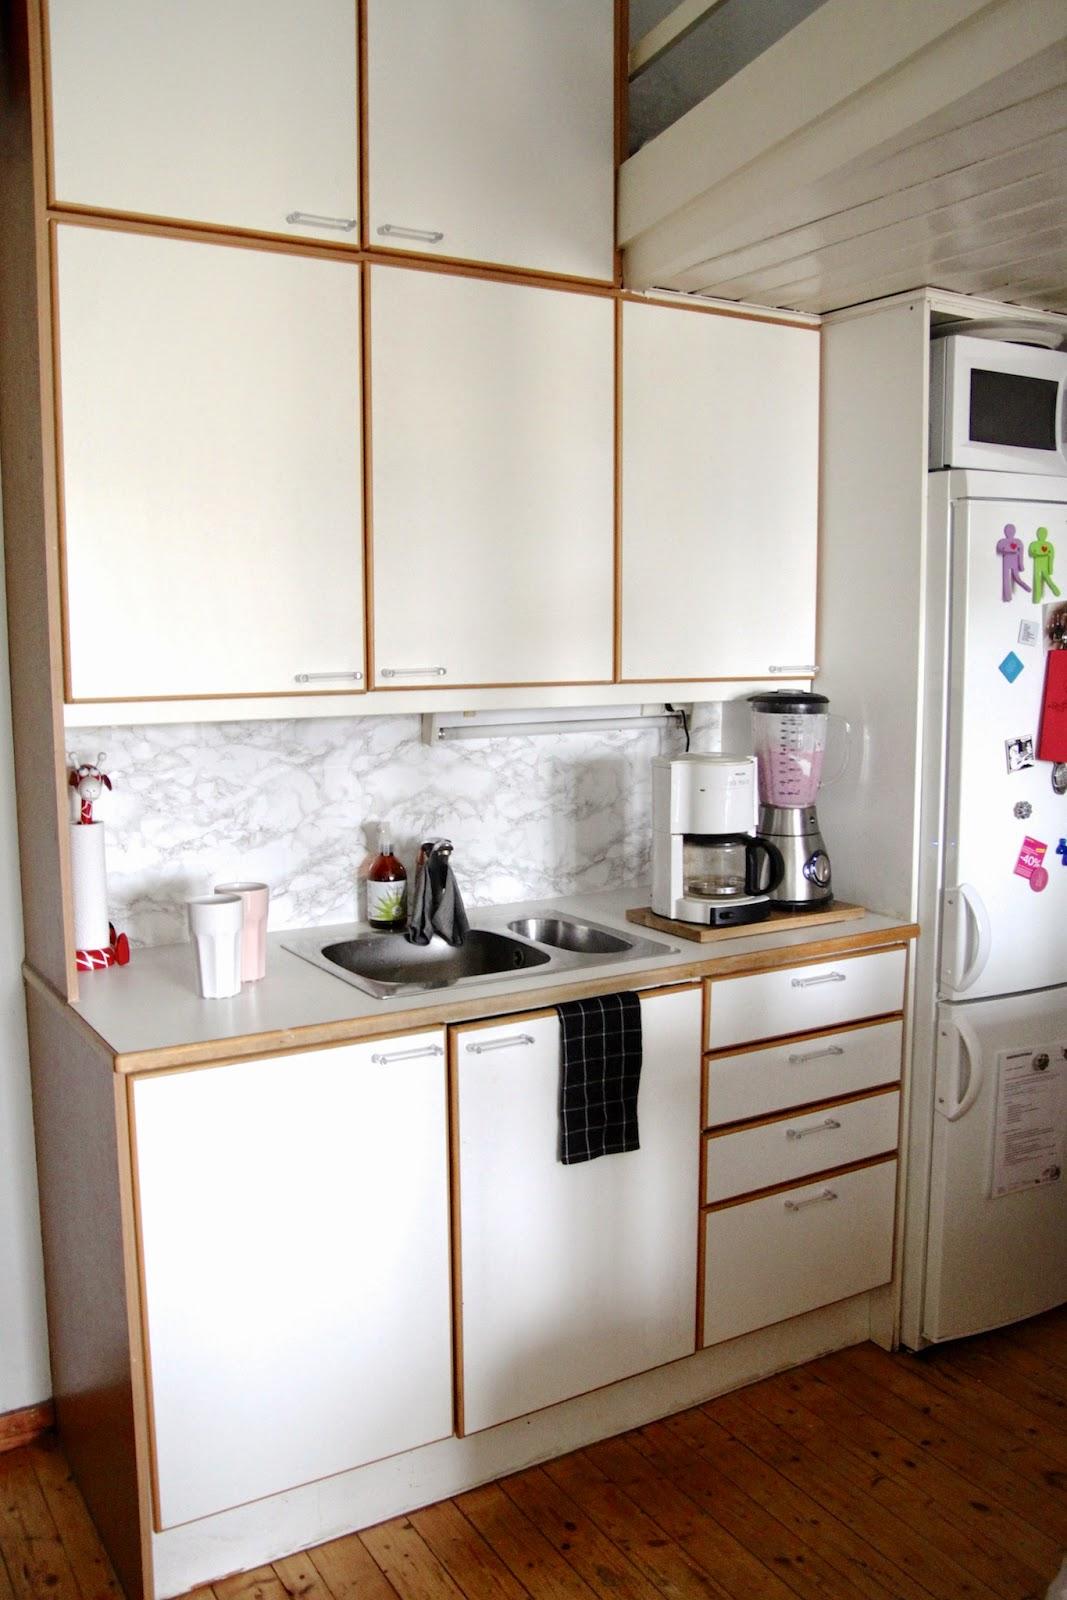 sis tiloissa dc fix keitti ss. Black Bedroom Furniture Sets. Home Design Ideas